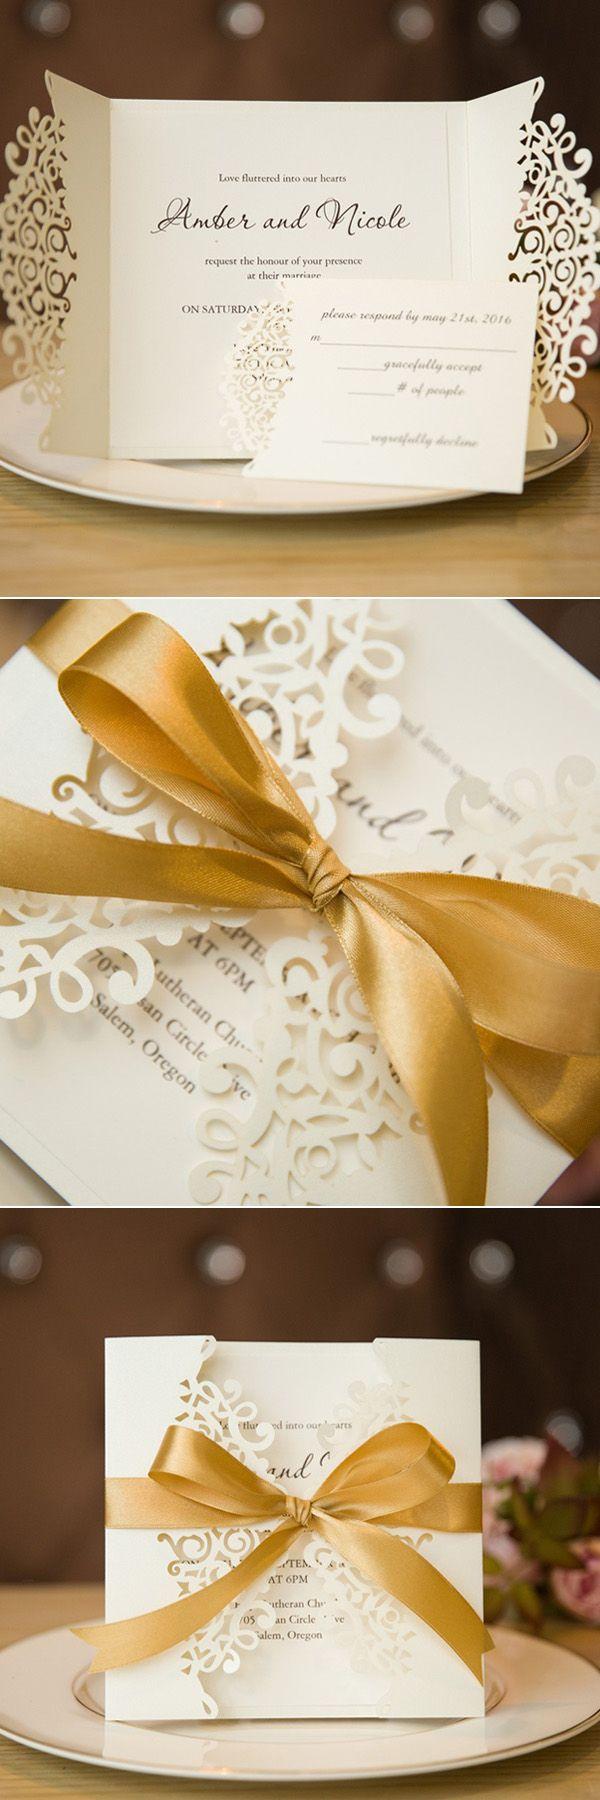 elegant laser cut wedding invitations with gold satin ribbon swws006 #stylishweddinginvitations